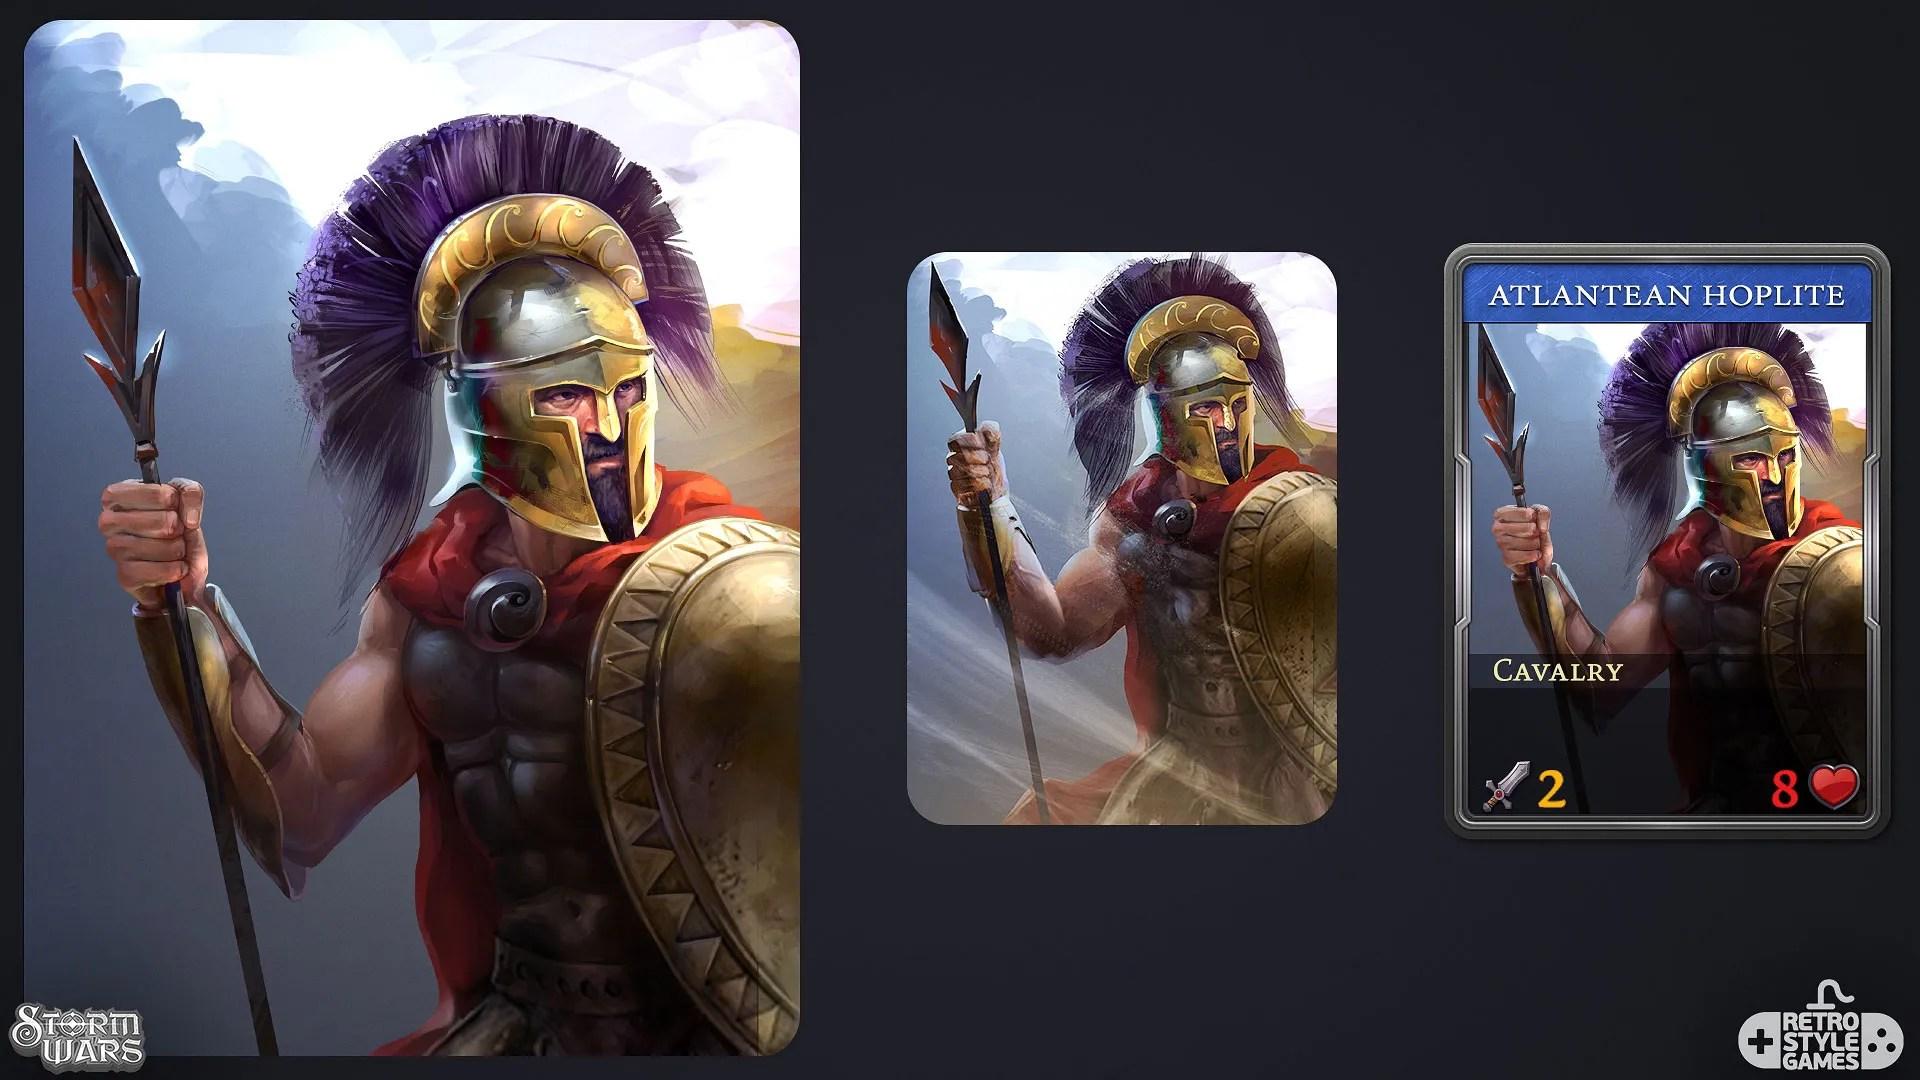 Storm Wars Collectible Cards Atlantean